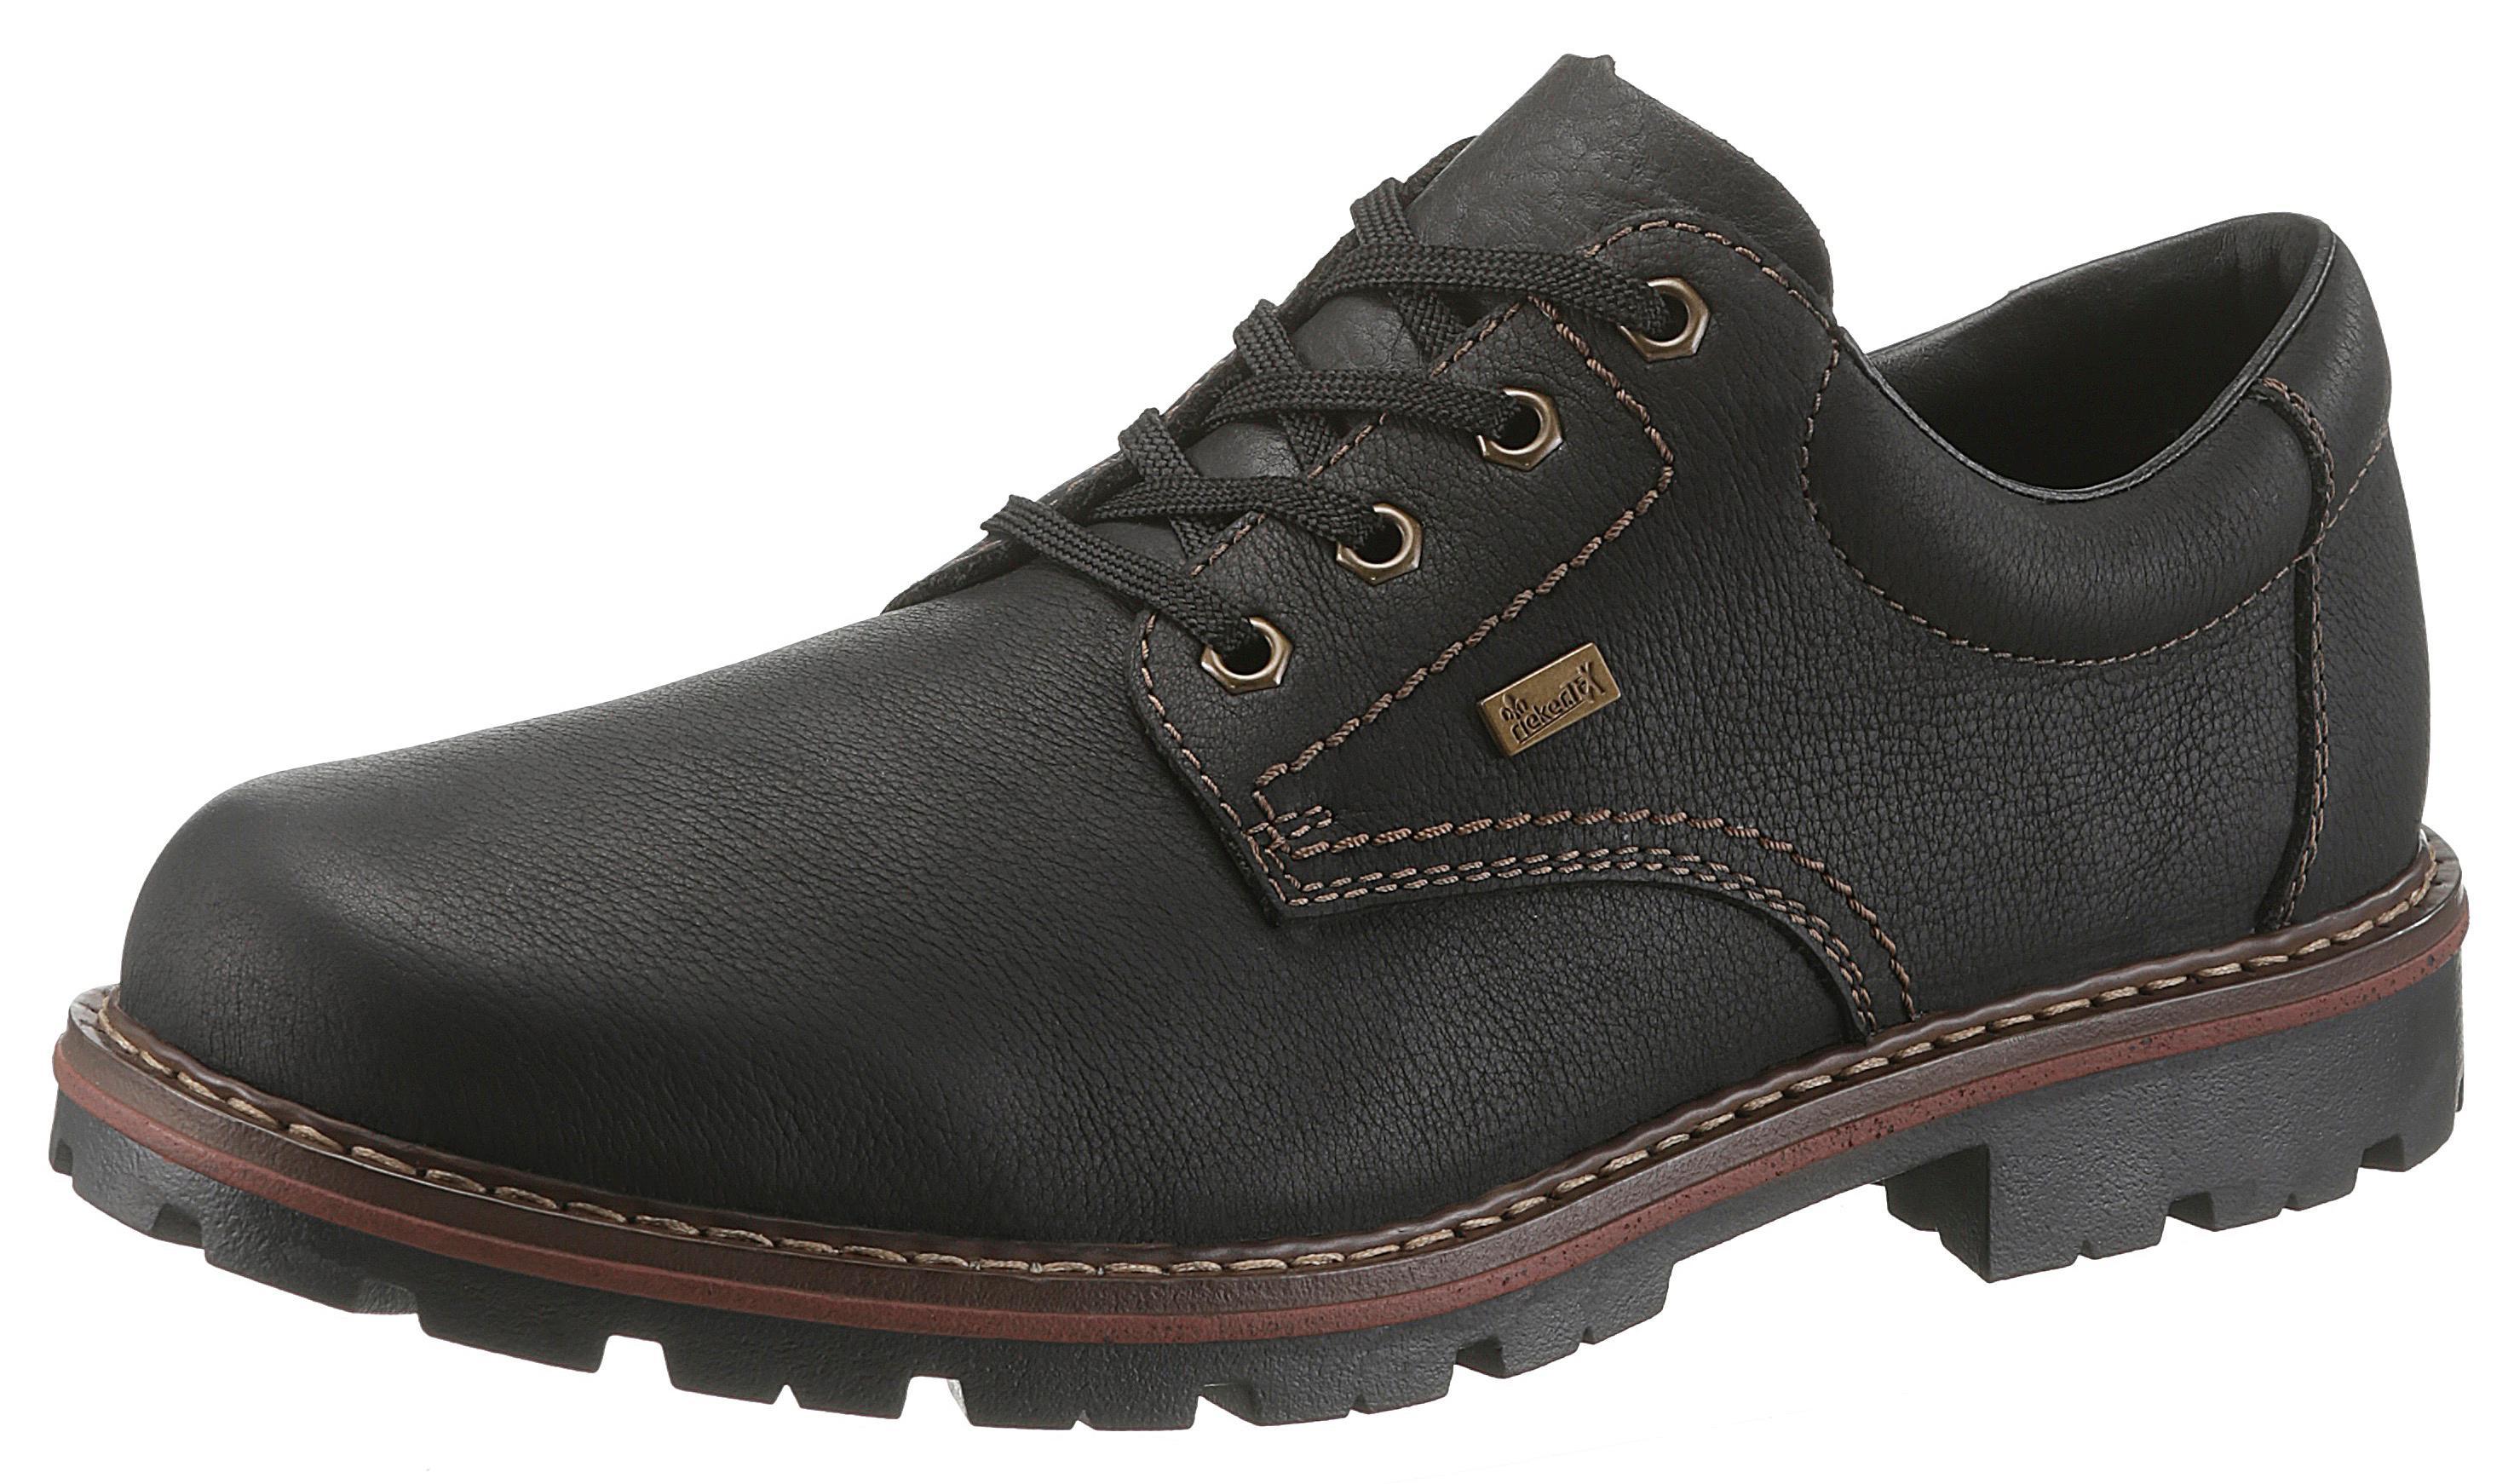 Rieker Schnürschuh | Schuhe > Schnürschuhe | Schwarz | RIEKER